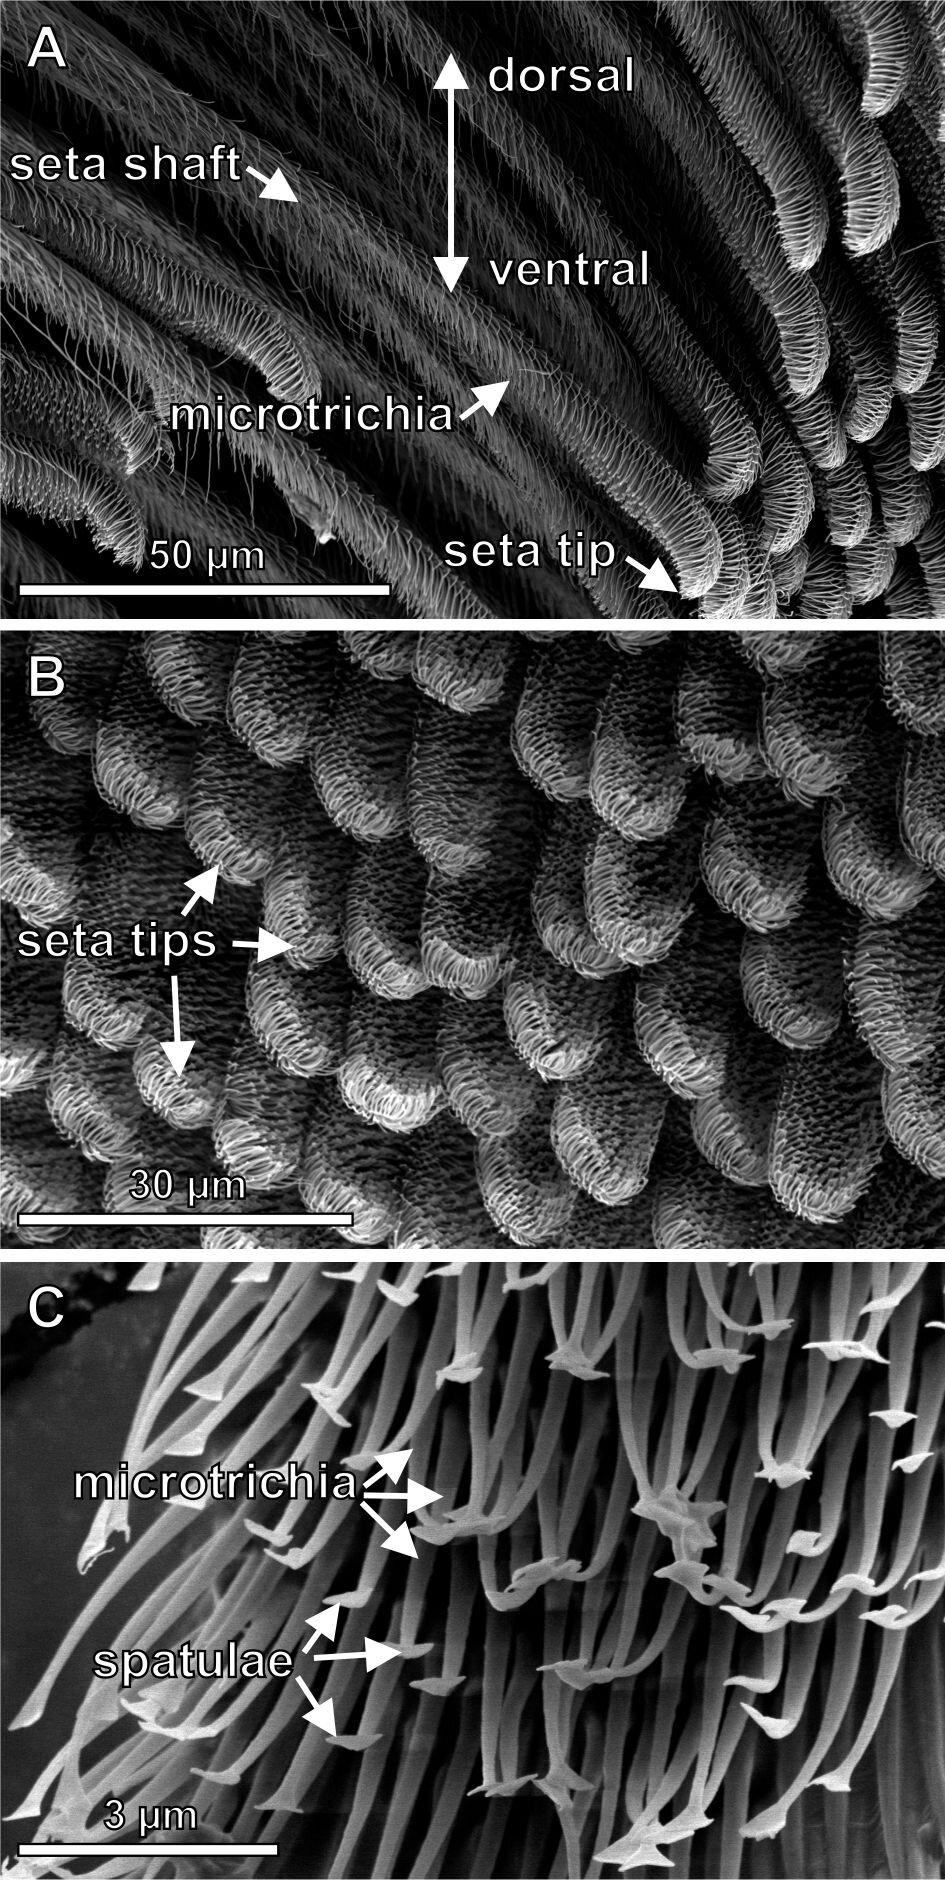 Лапки павуків надихнули вчених на створення потужного оборотного клею